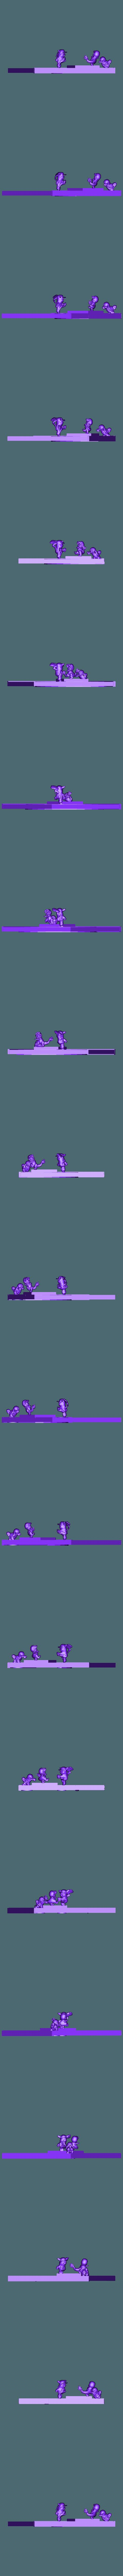 terrain de baseball pikachu salameche carapuce.stl Download STL file Baseball Pikachu Salamèche carapuce • 3D printing template, Majin59